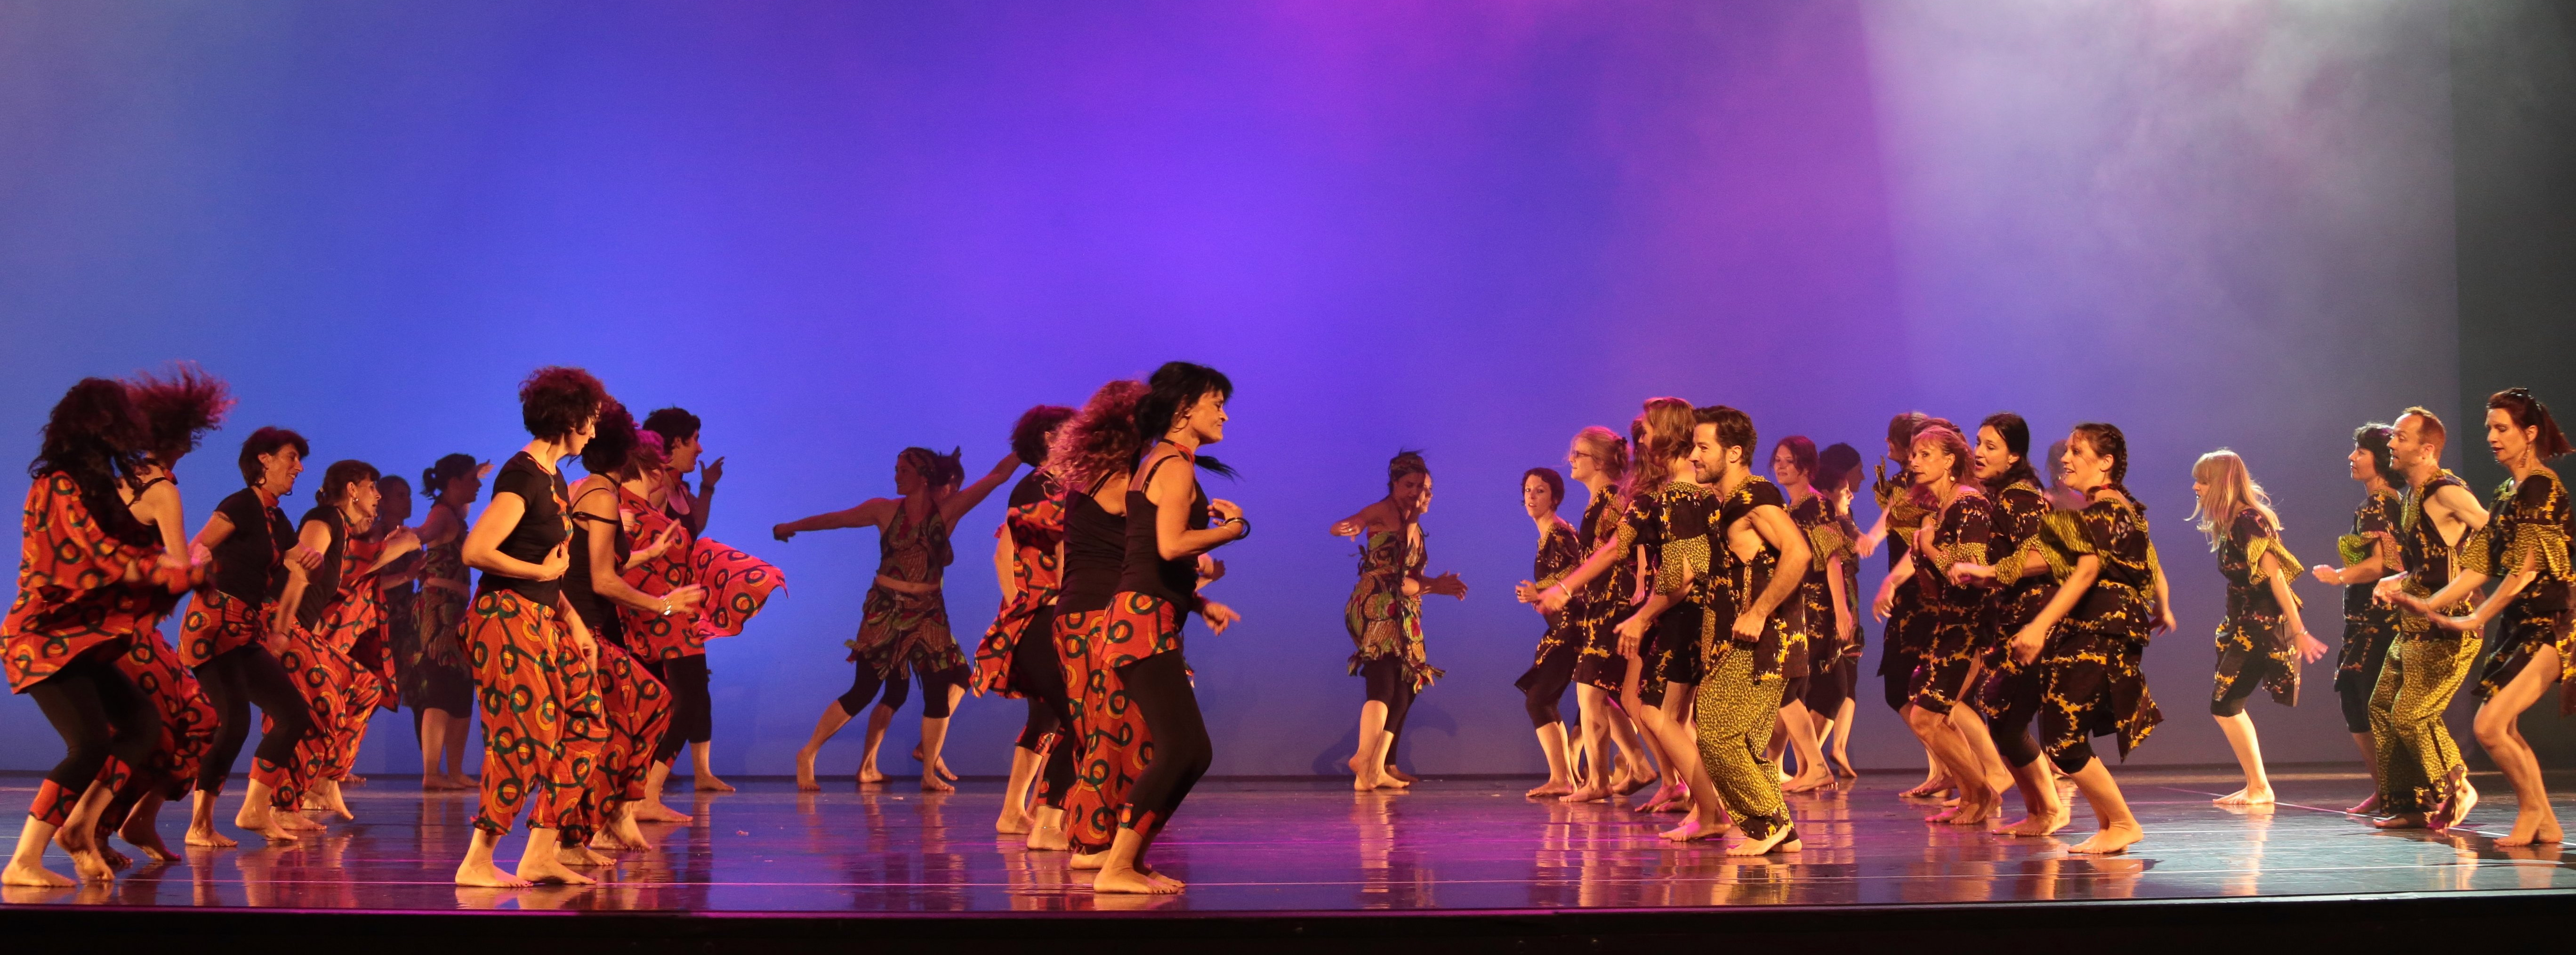 danse-africaine-montpellier40